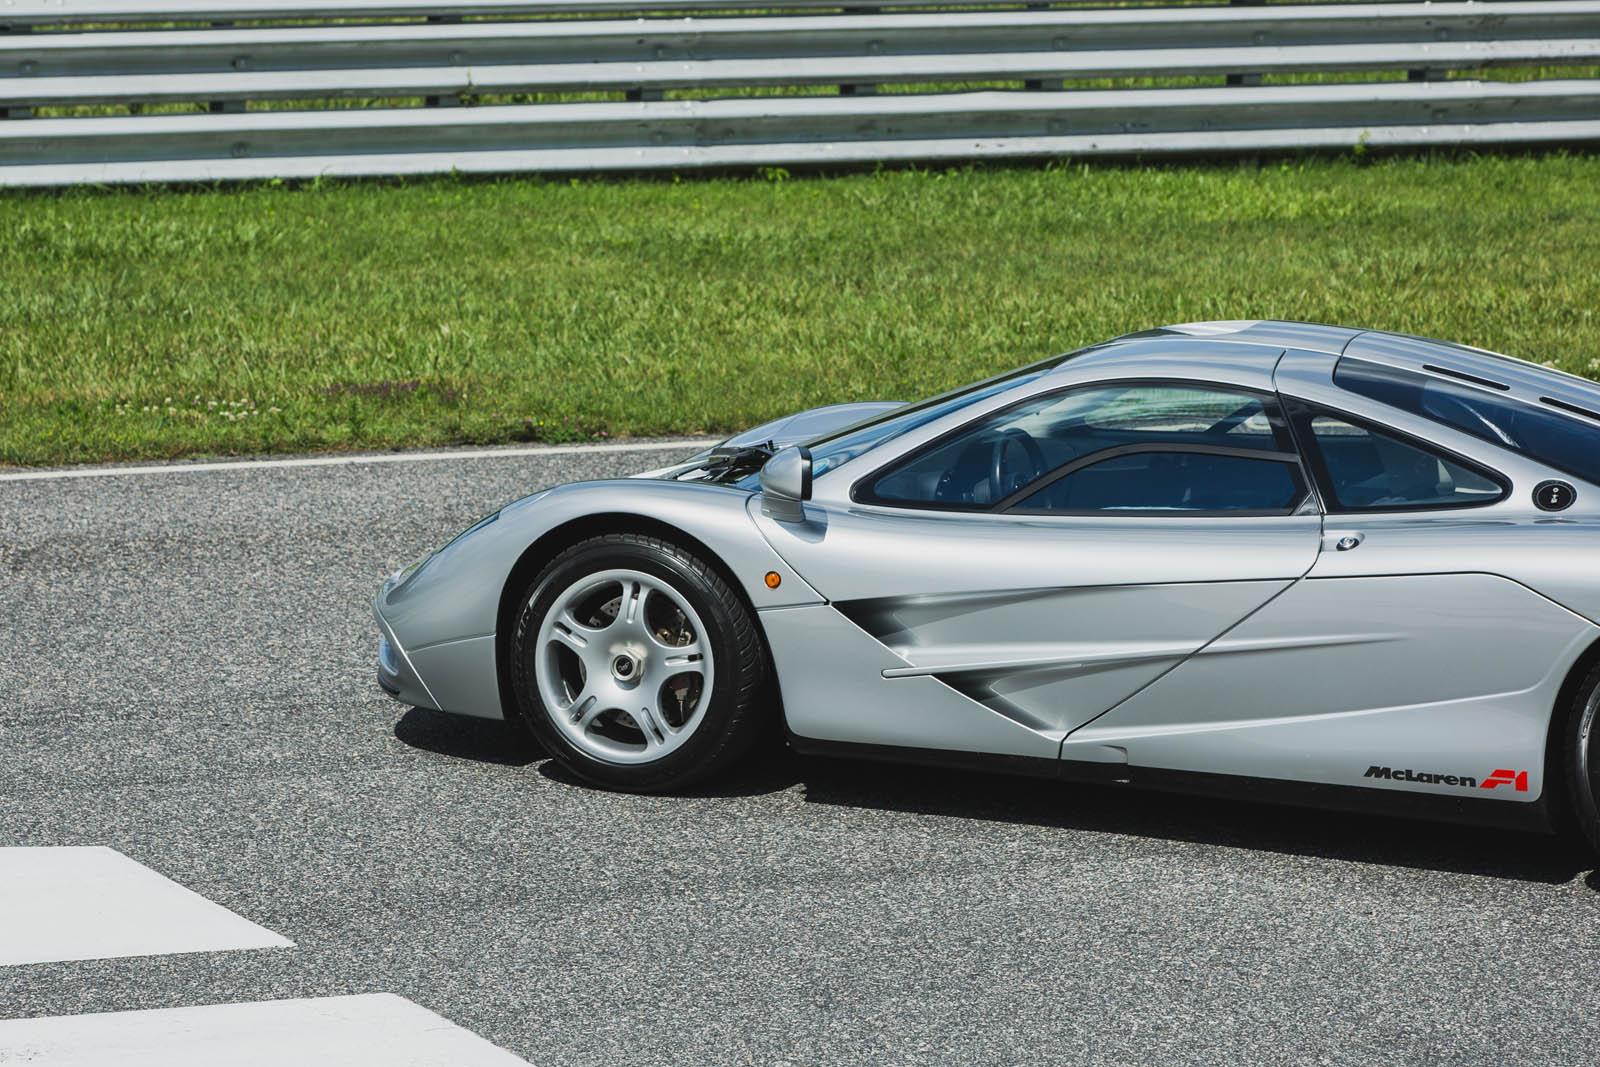 McLaren_F1-27 copy